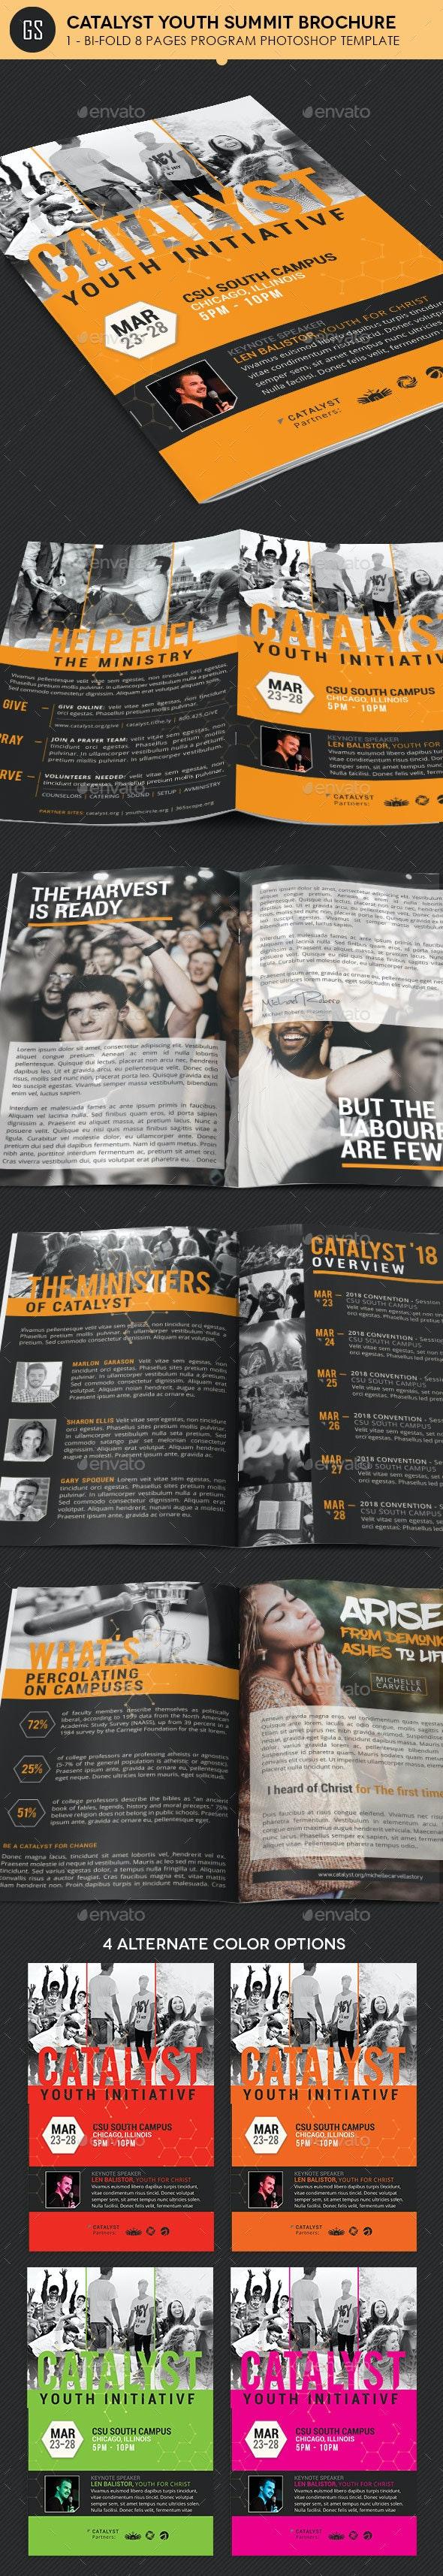 Catalyst Youth Summit Bi-Fold Program Template - Informational Brochures